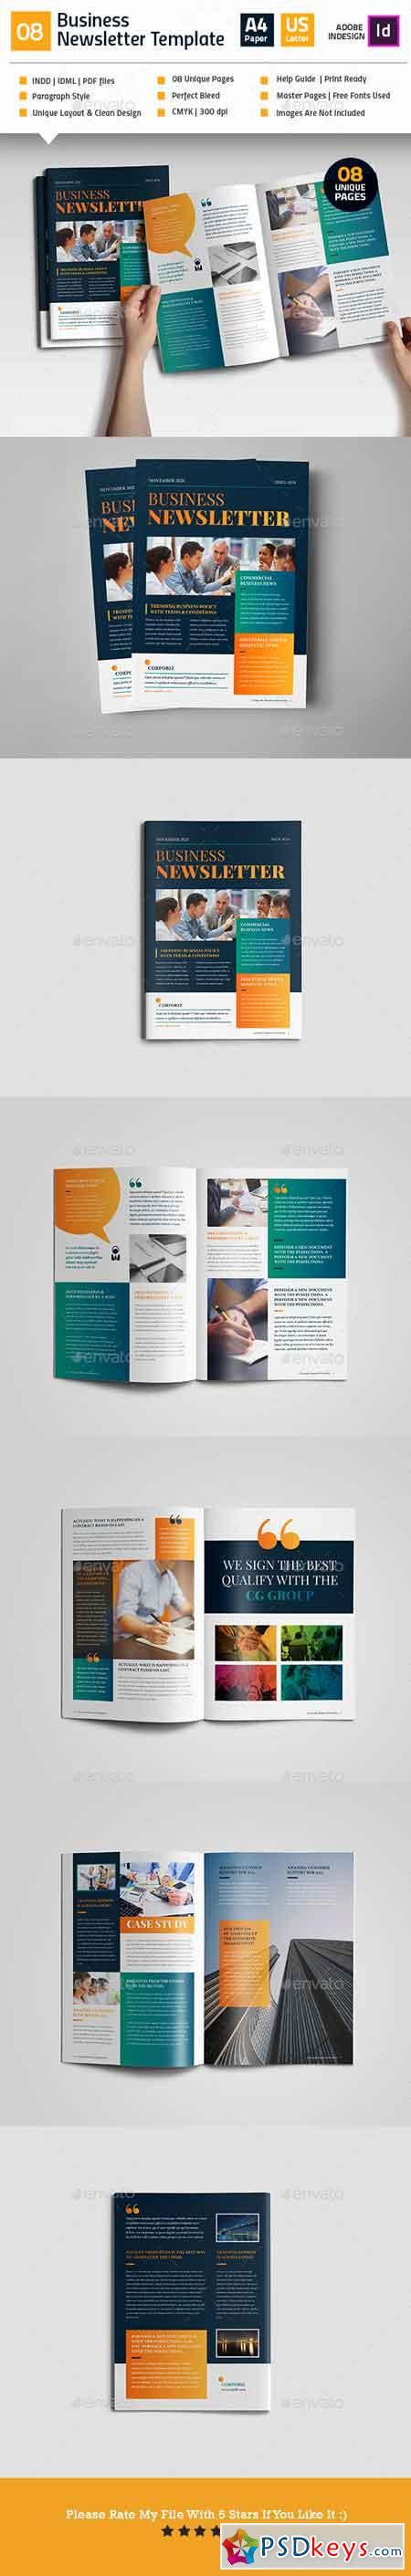 Clean Business Newsletter V08 19174814